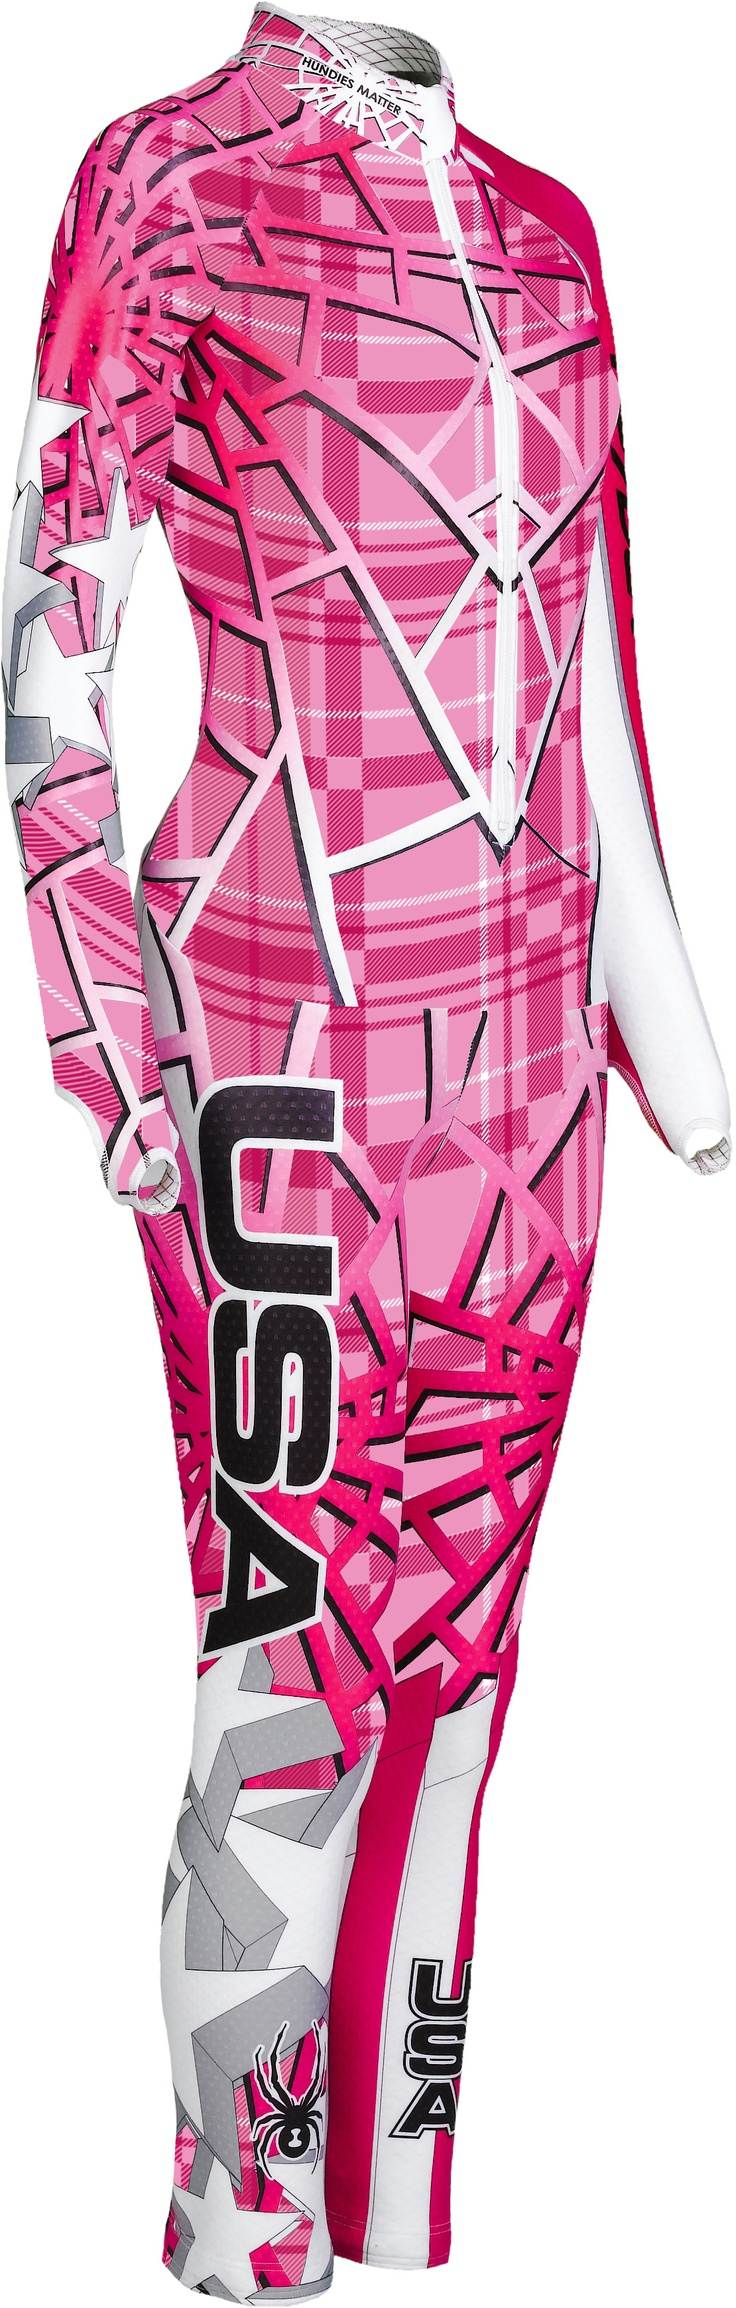 Favorite speed suit! Lindsay Vonn design w/ 3DO